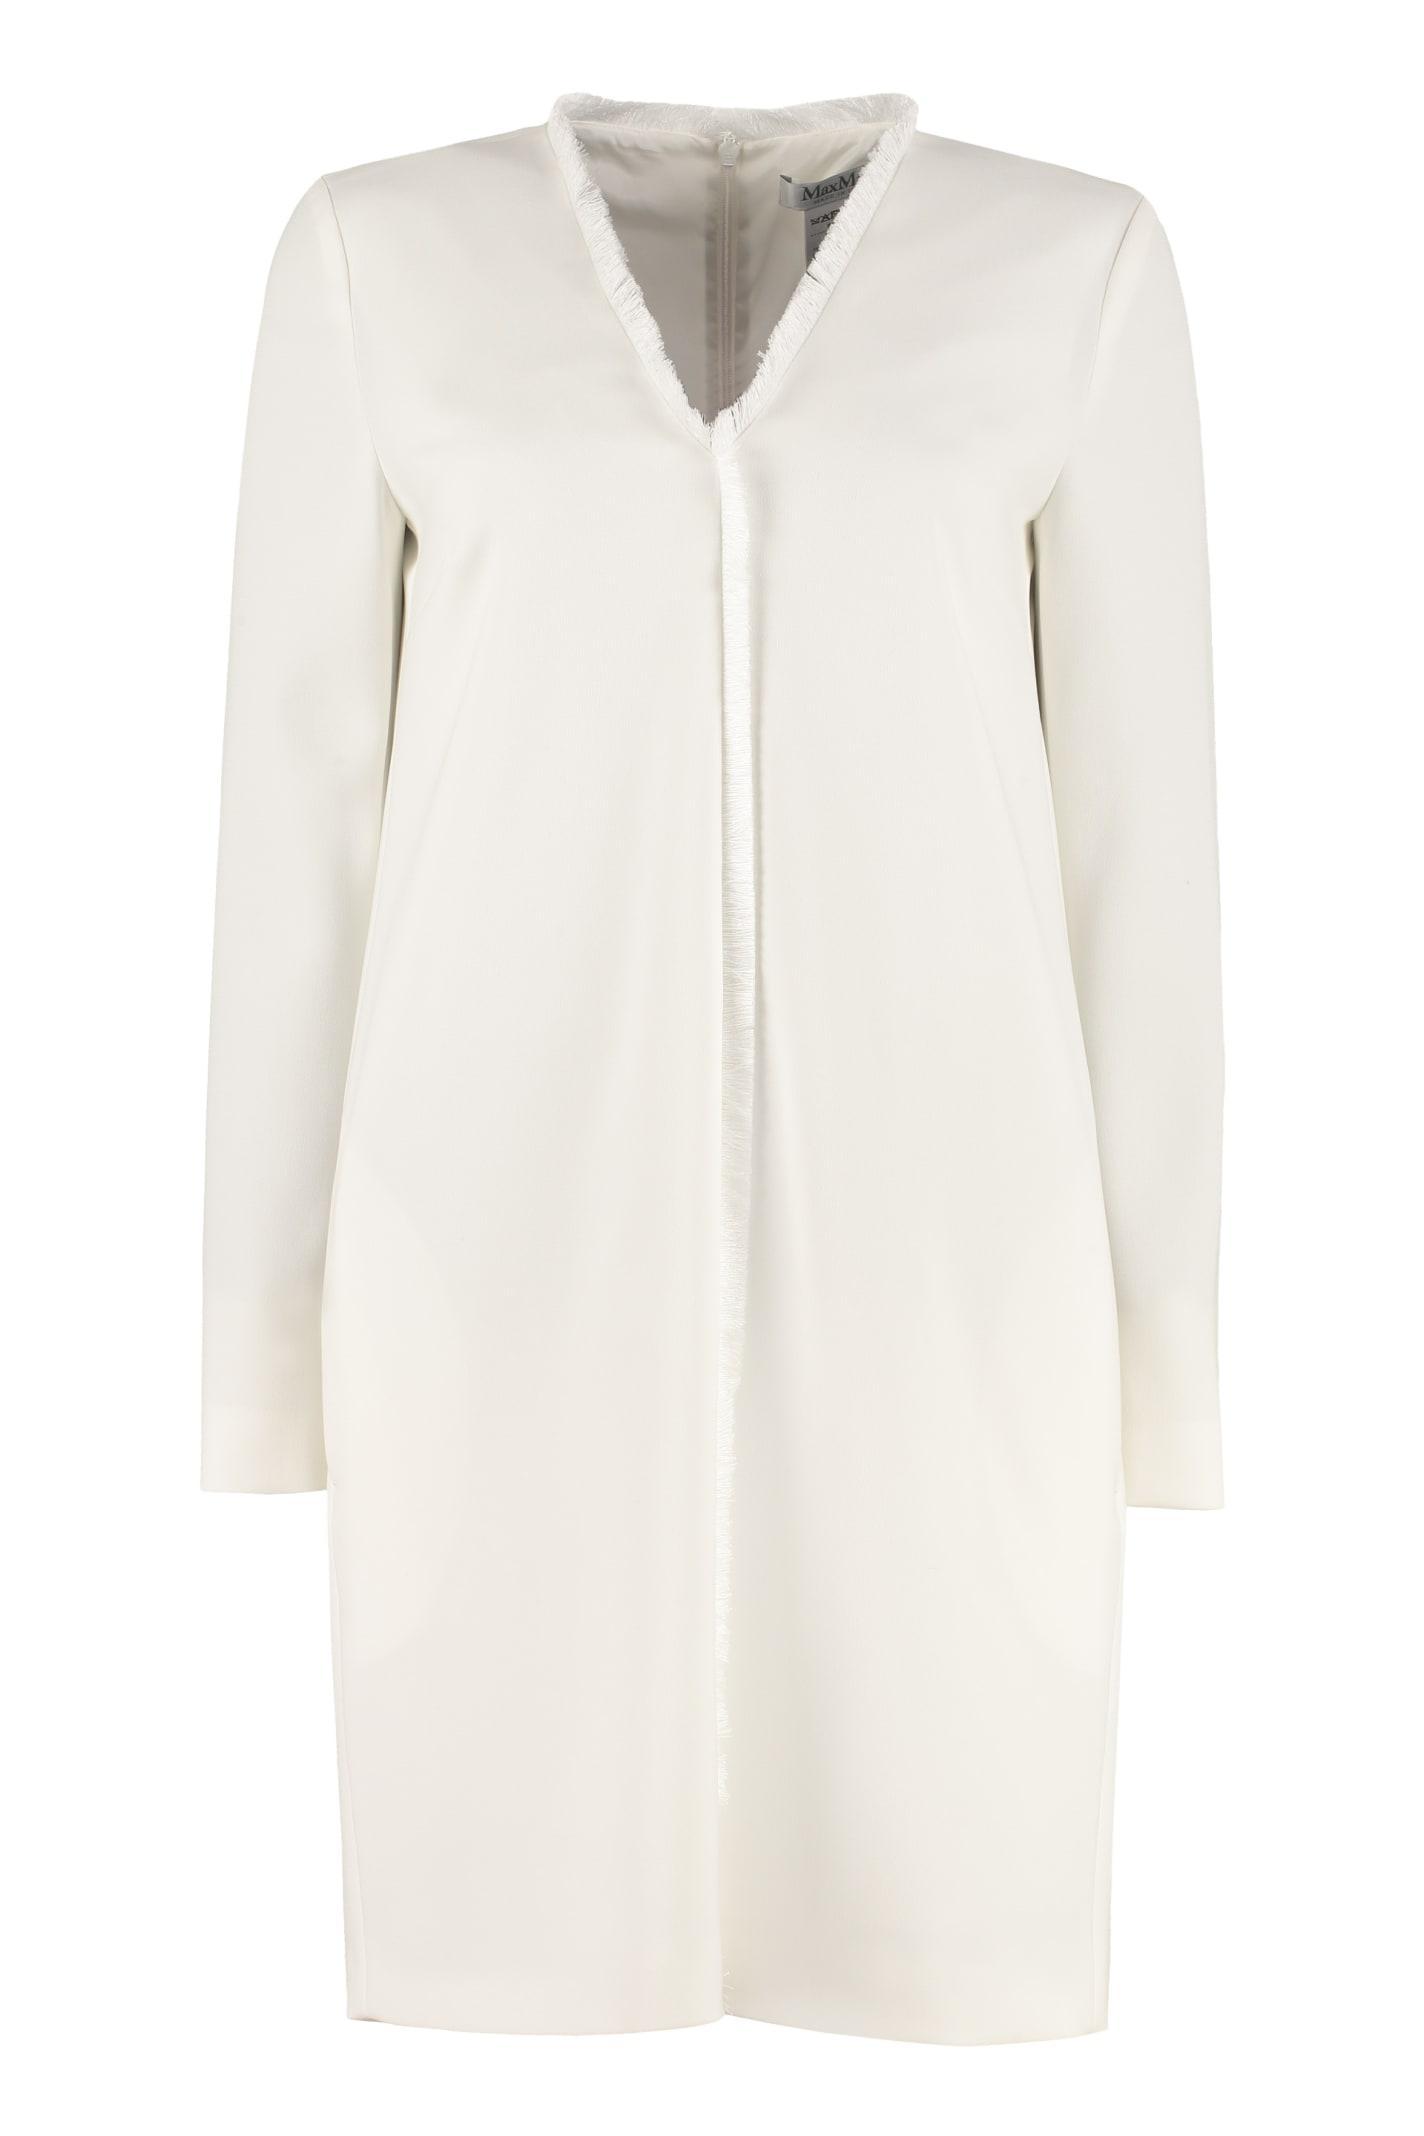 Buy Max Mara Candela Sheath Dress online, shop Max Mara with free shipping